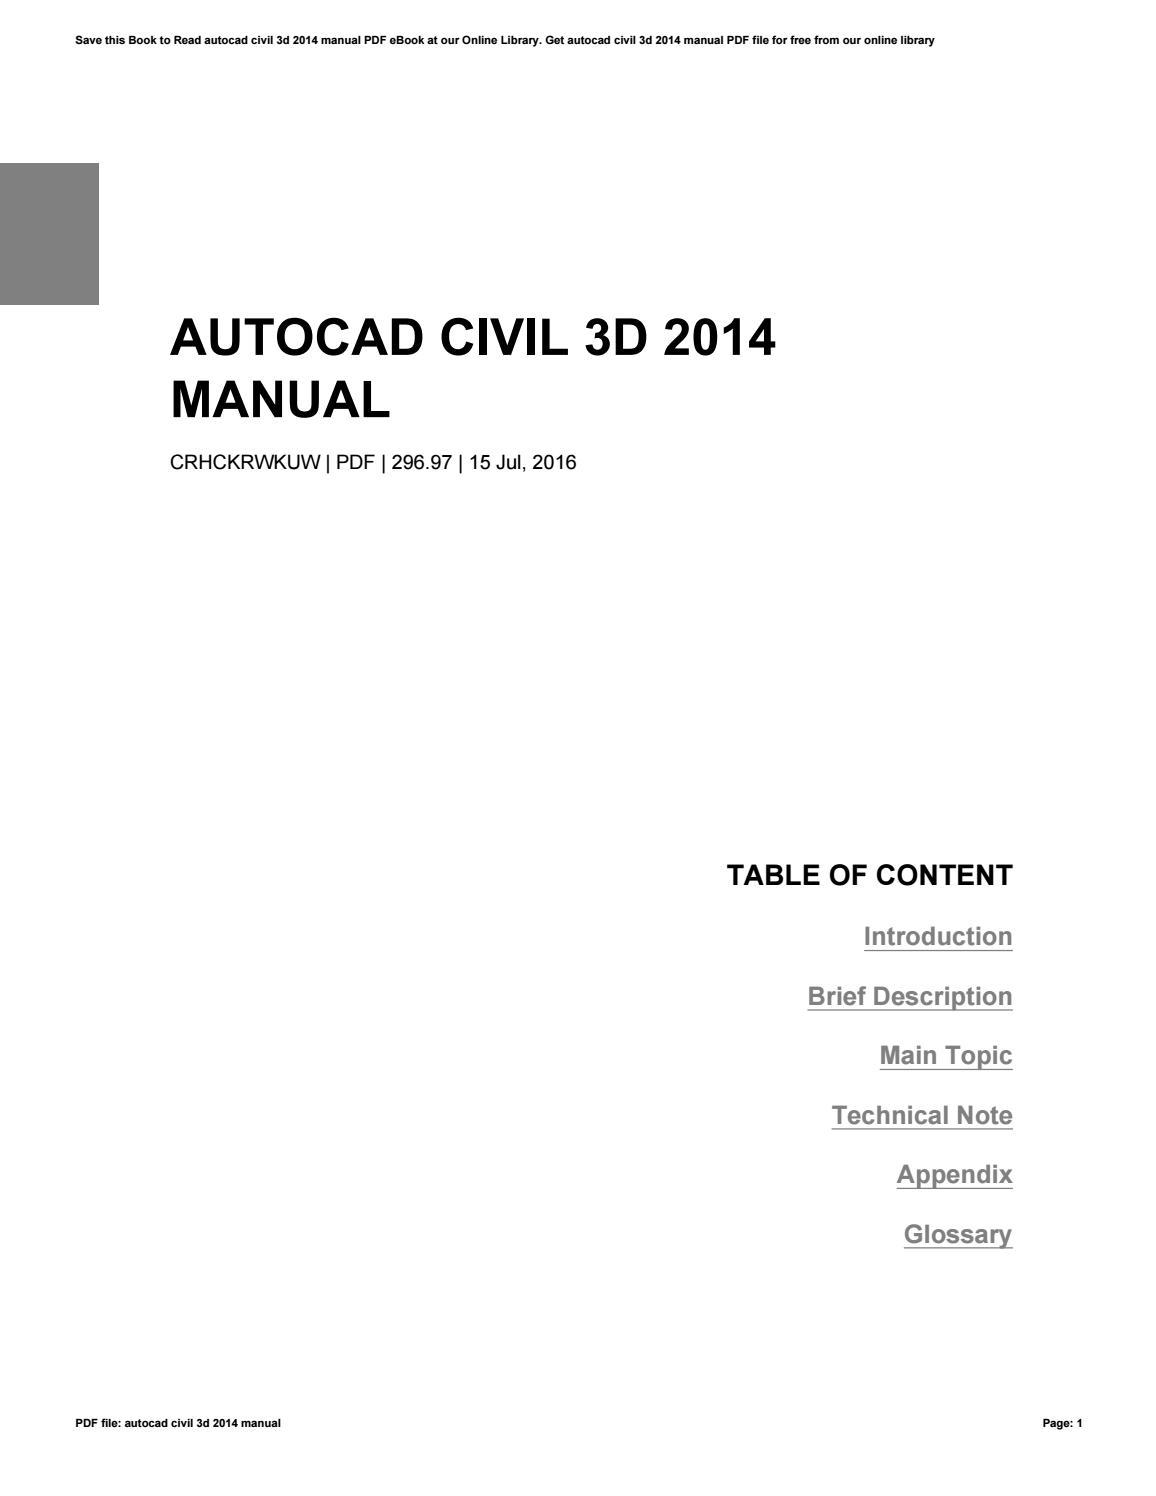 Civil 3d Tutorial Pdf